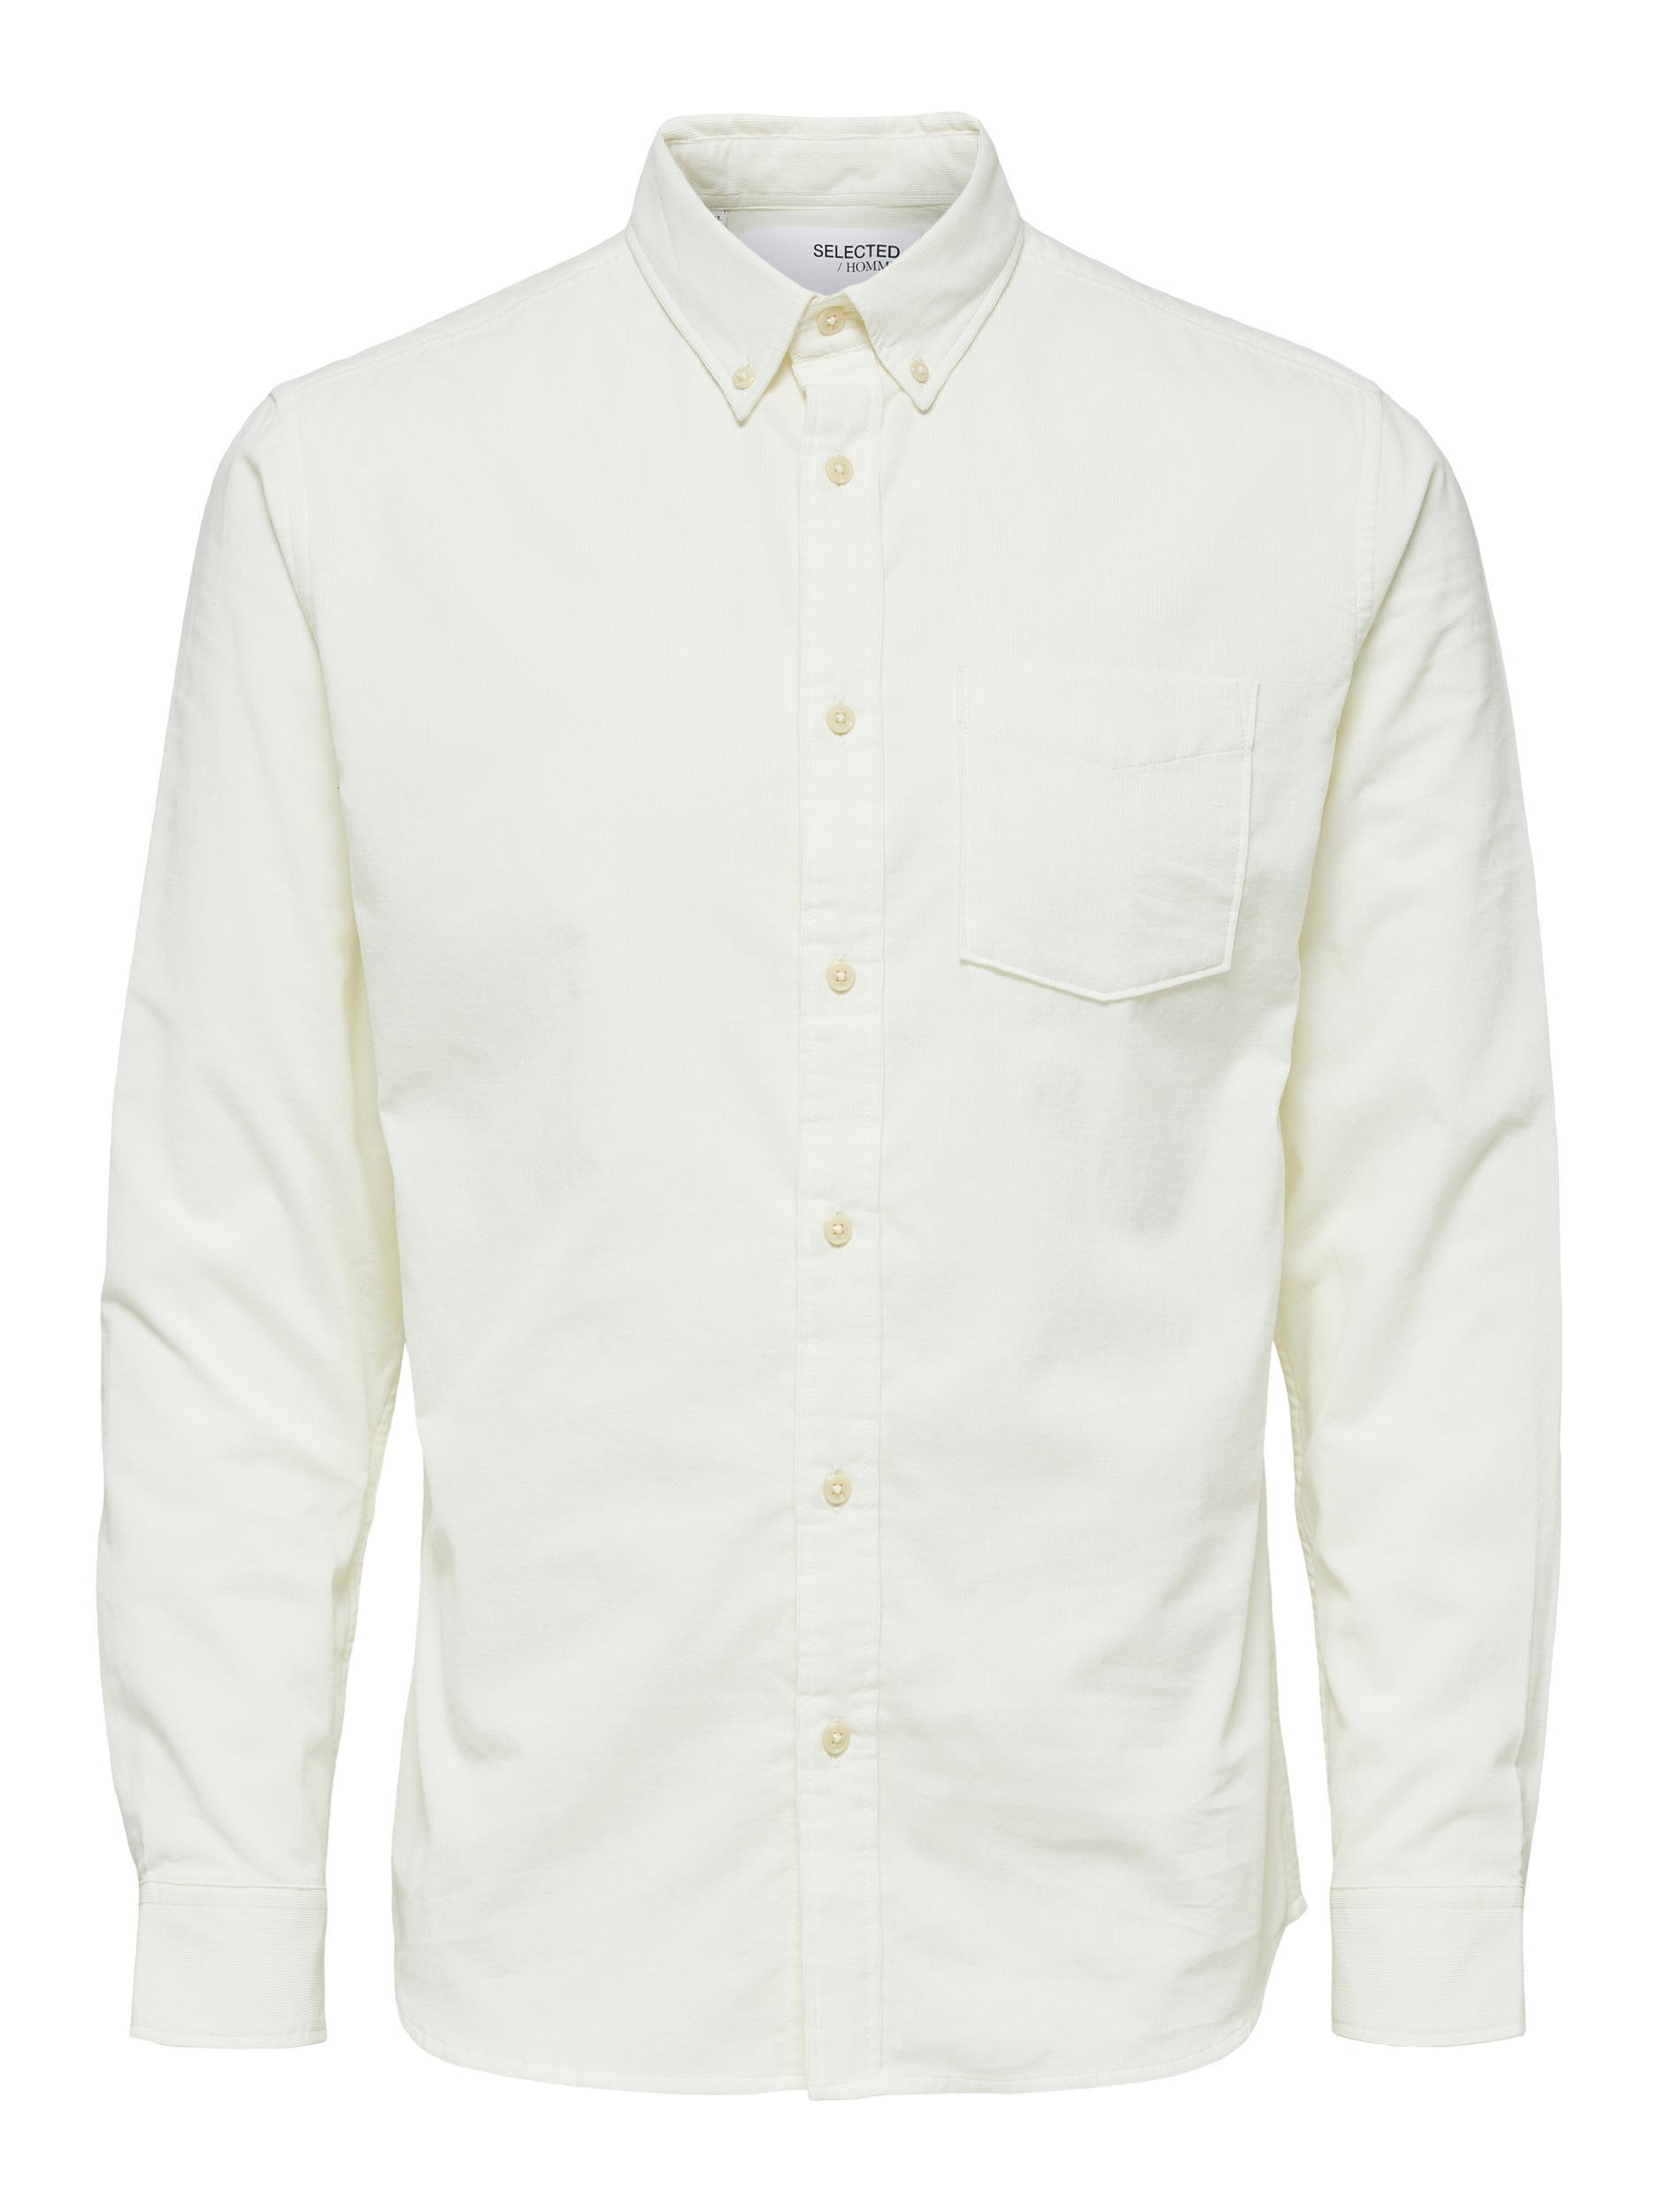 Selected Homme Slimoscar LS skjorte, egret, Small